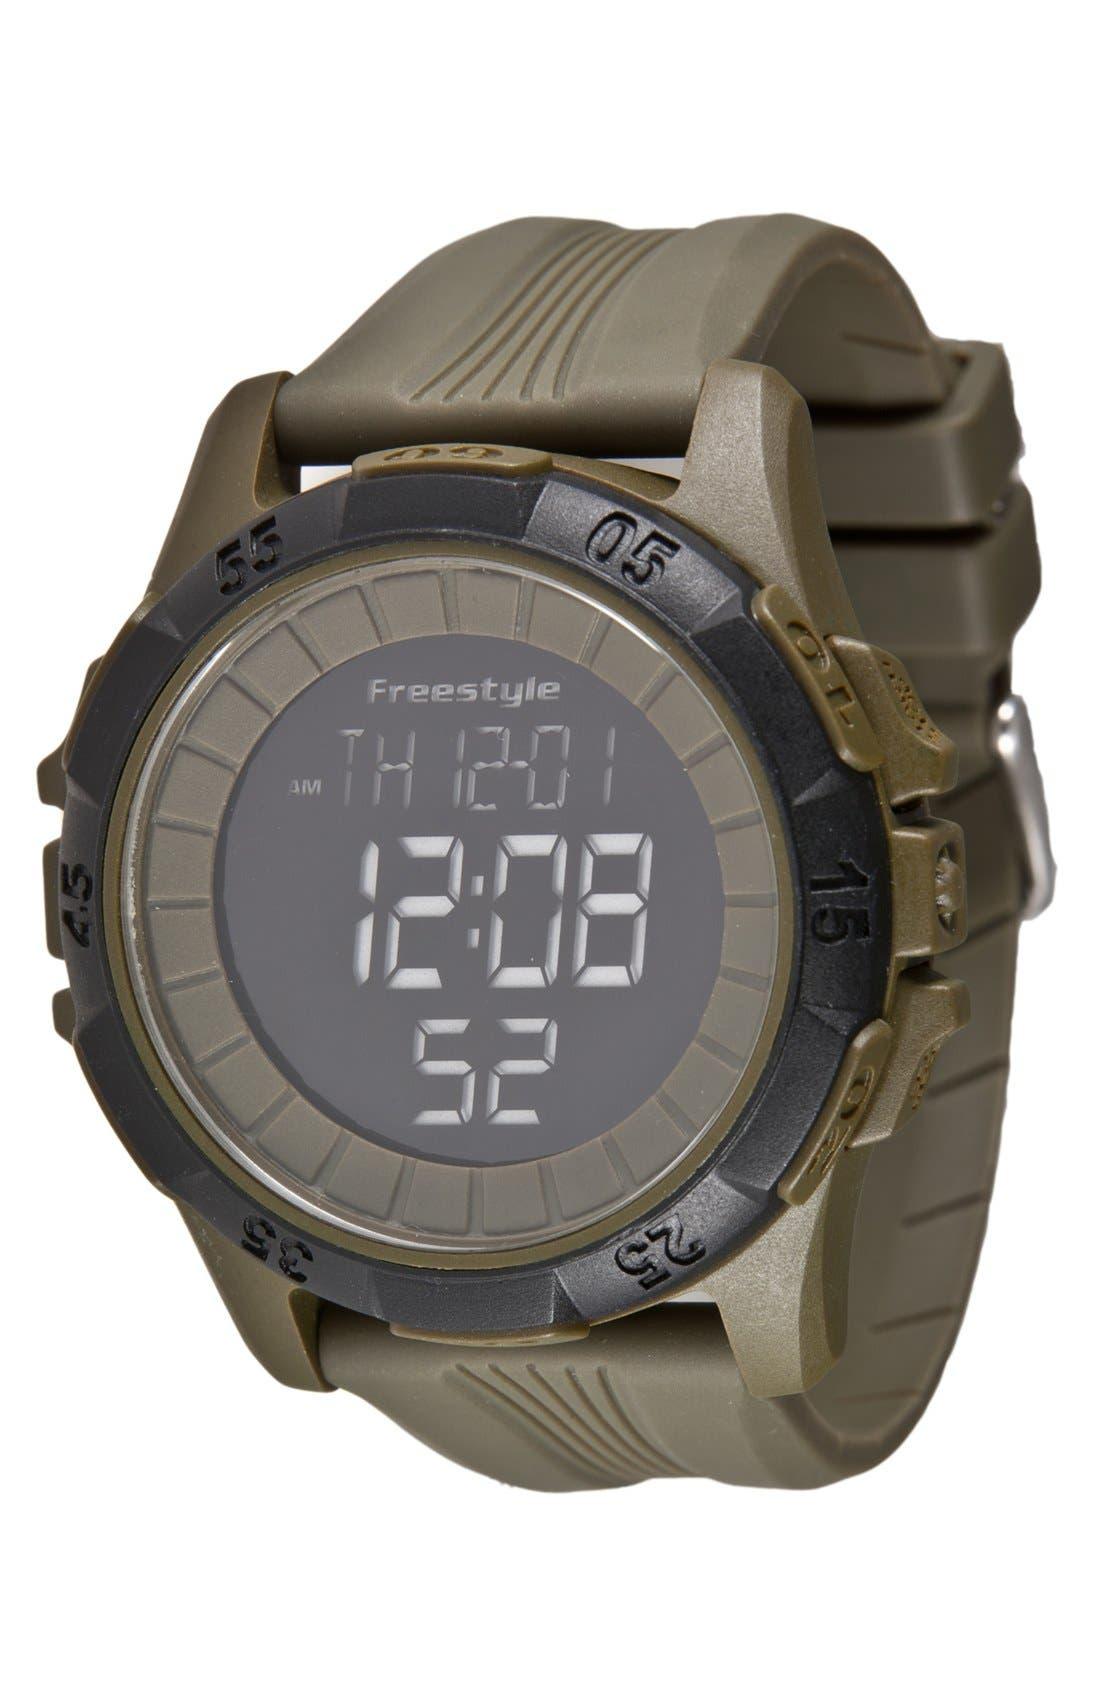 Main Image - Freestyle 'Kampus' Round Digital Watch, 47mm